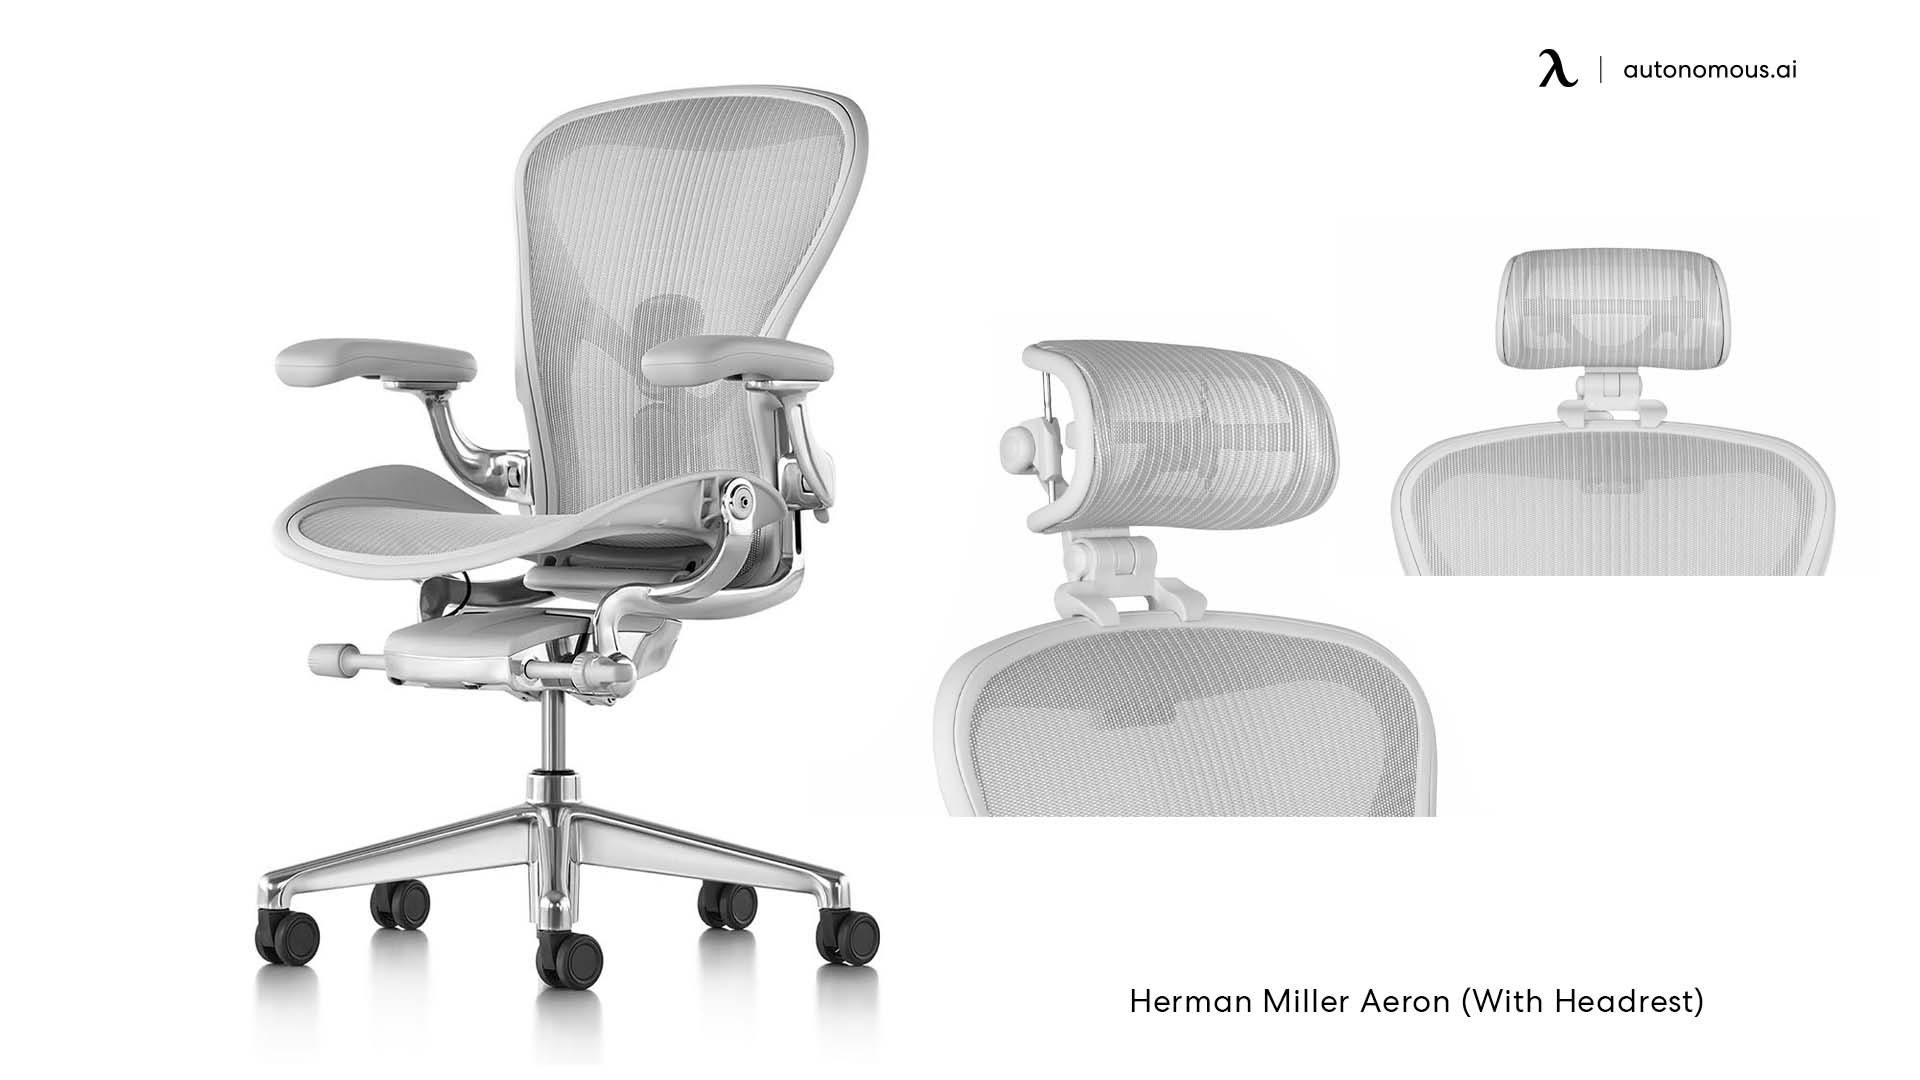 Herman Miller Aeron (With Headrest)